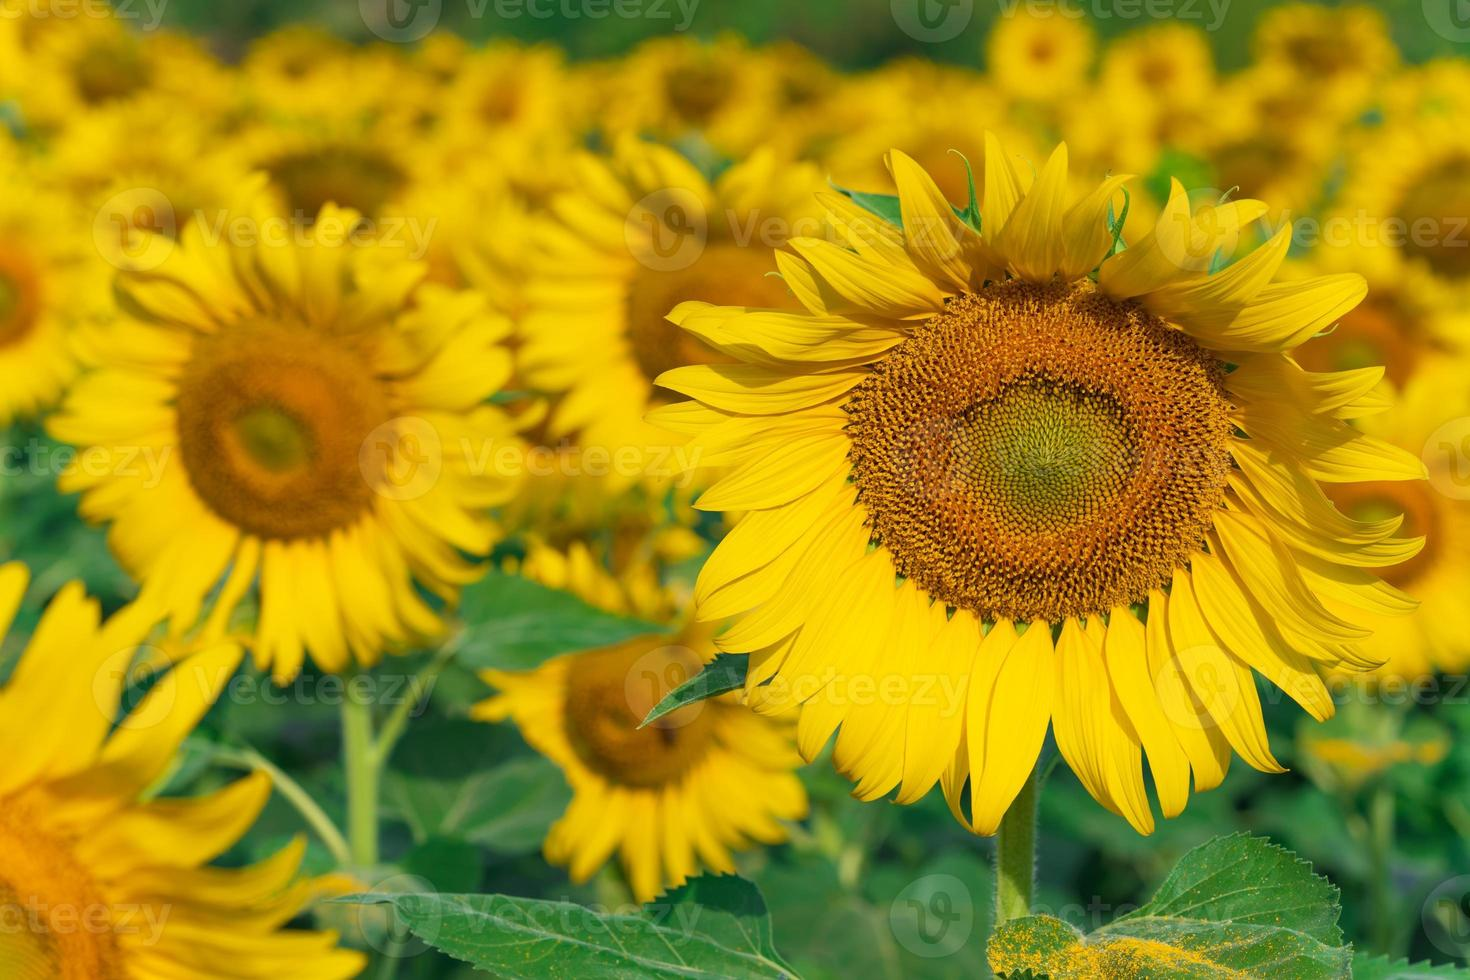 fond naturel de tournesols en fleurs photo